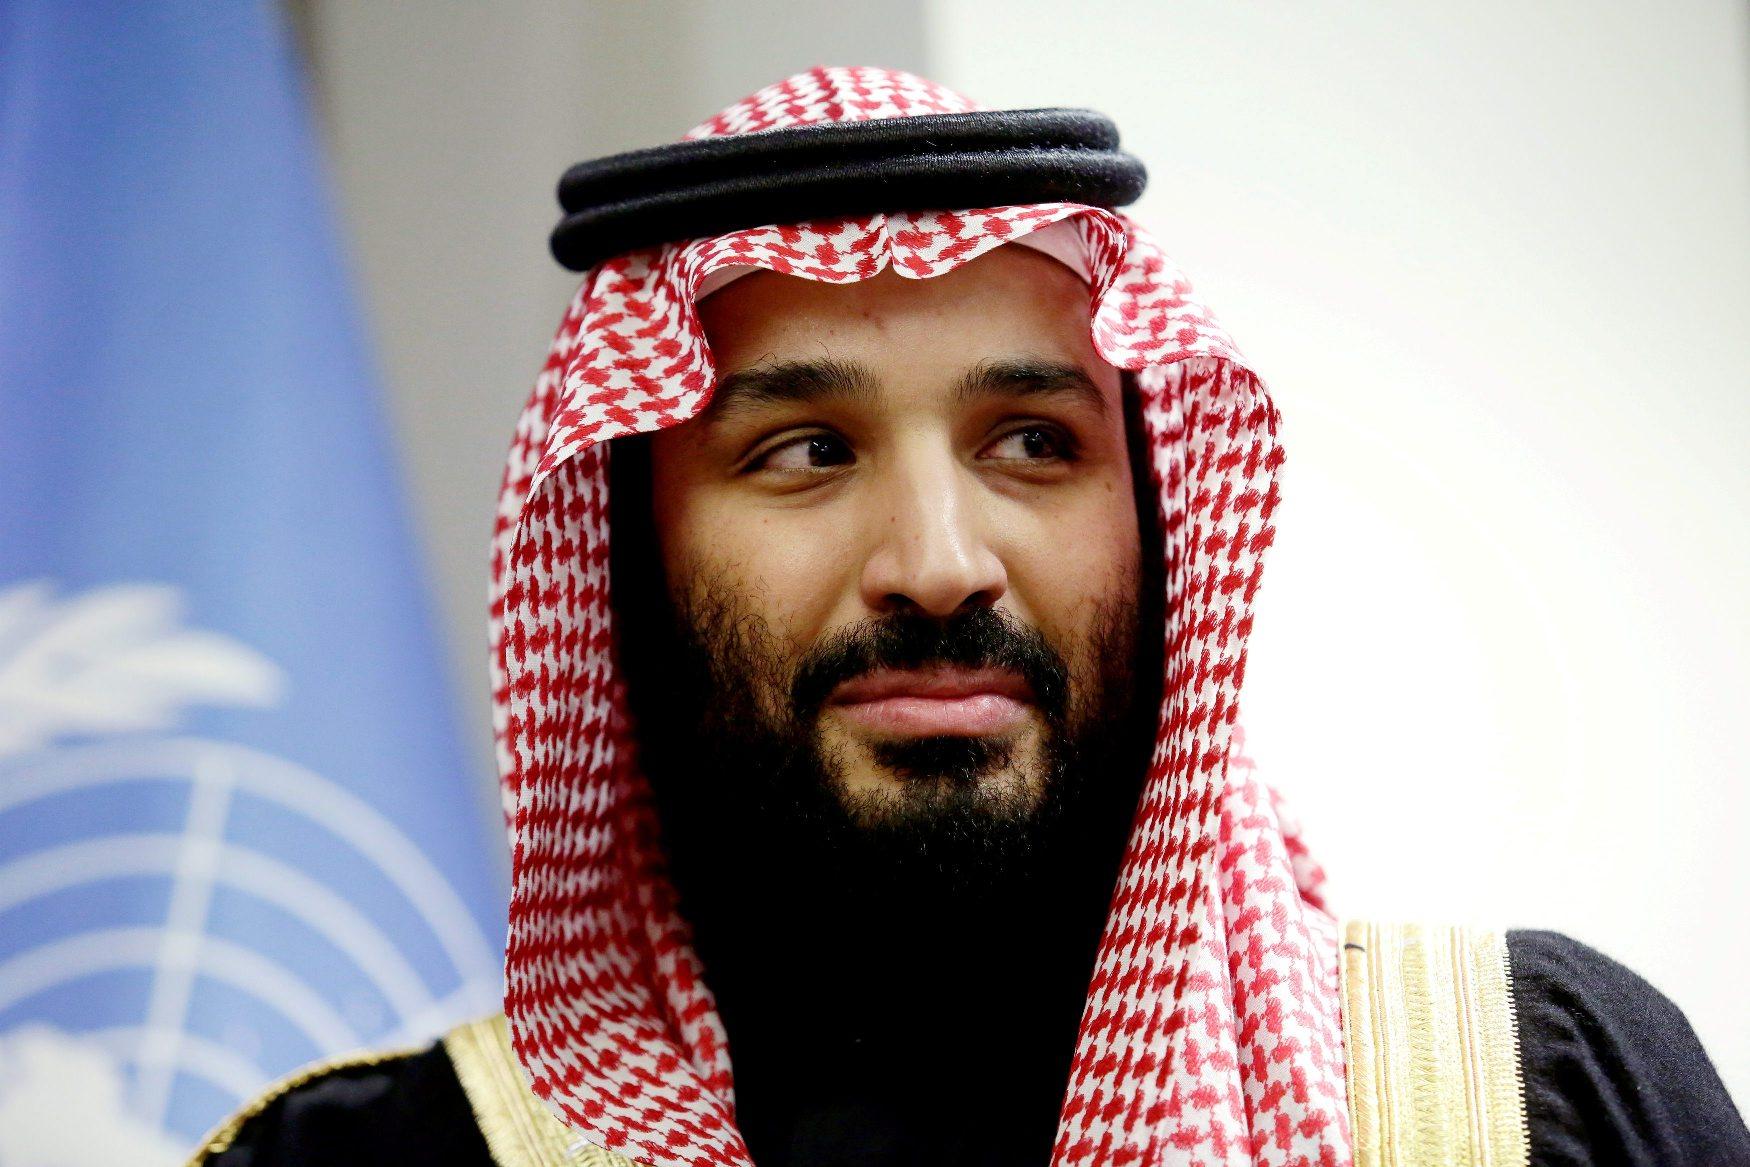 Prijestolonasljednik Mohamed bin Salman